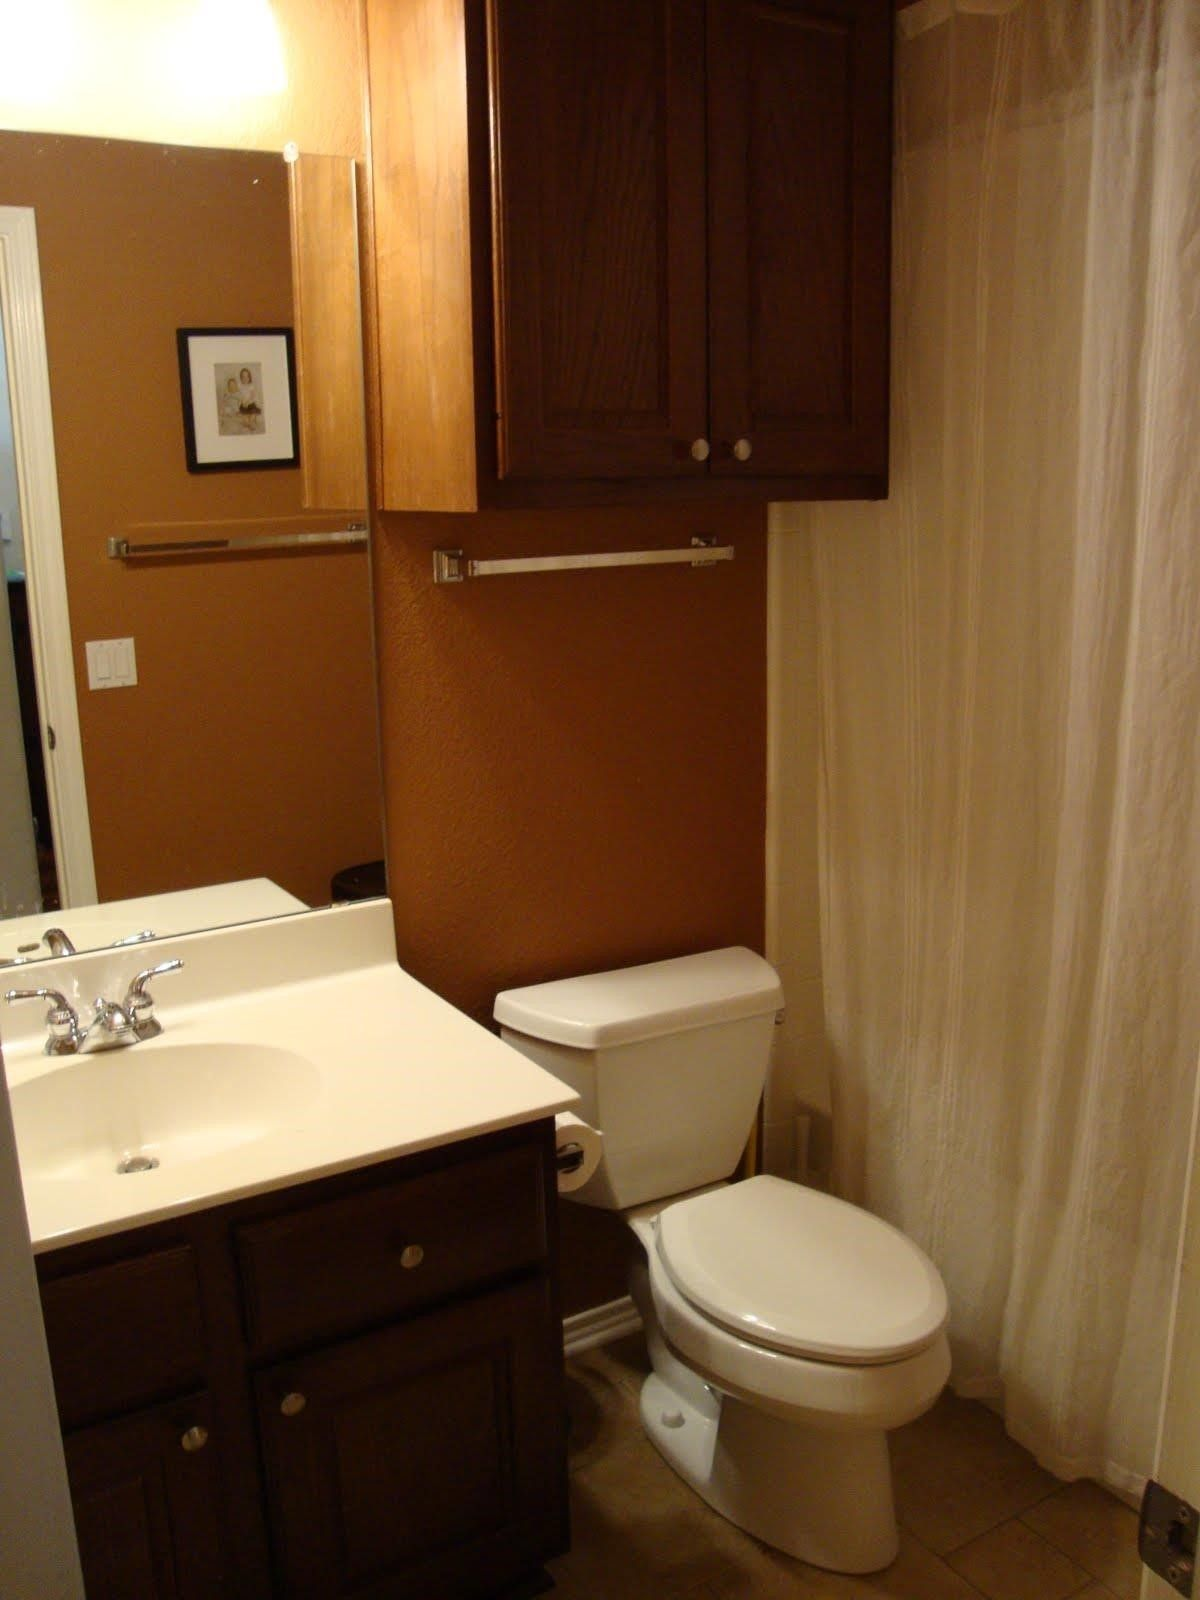 simple apartment bathroom decorating ideas. Great Ideas Of Beautiful Simple Apartment Bathroom Decorating For Visit Bdarop.com A